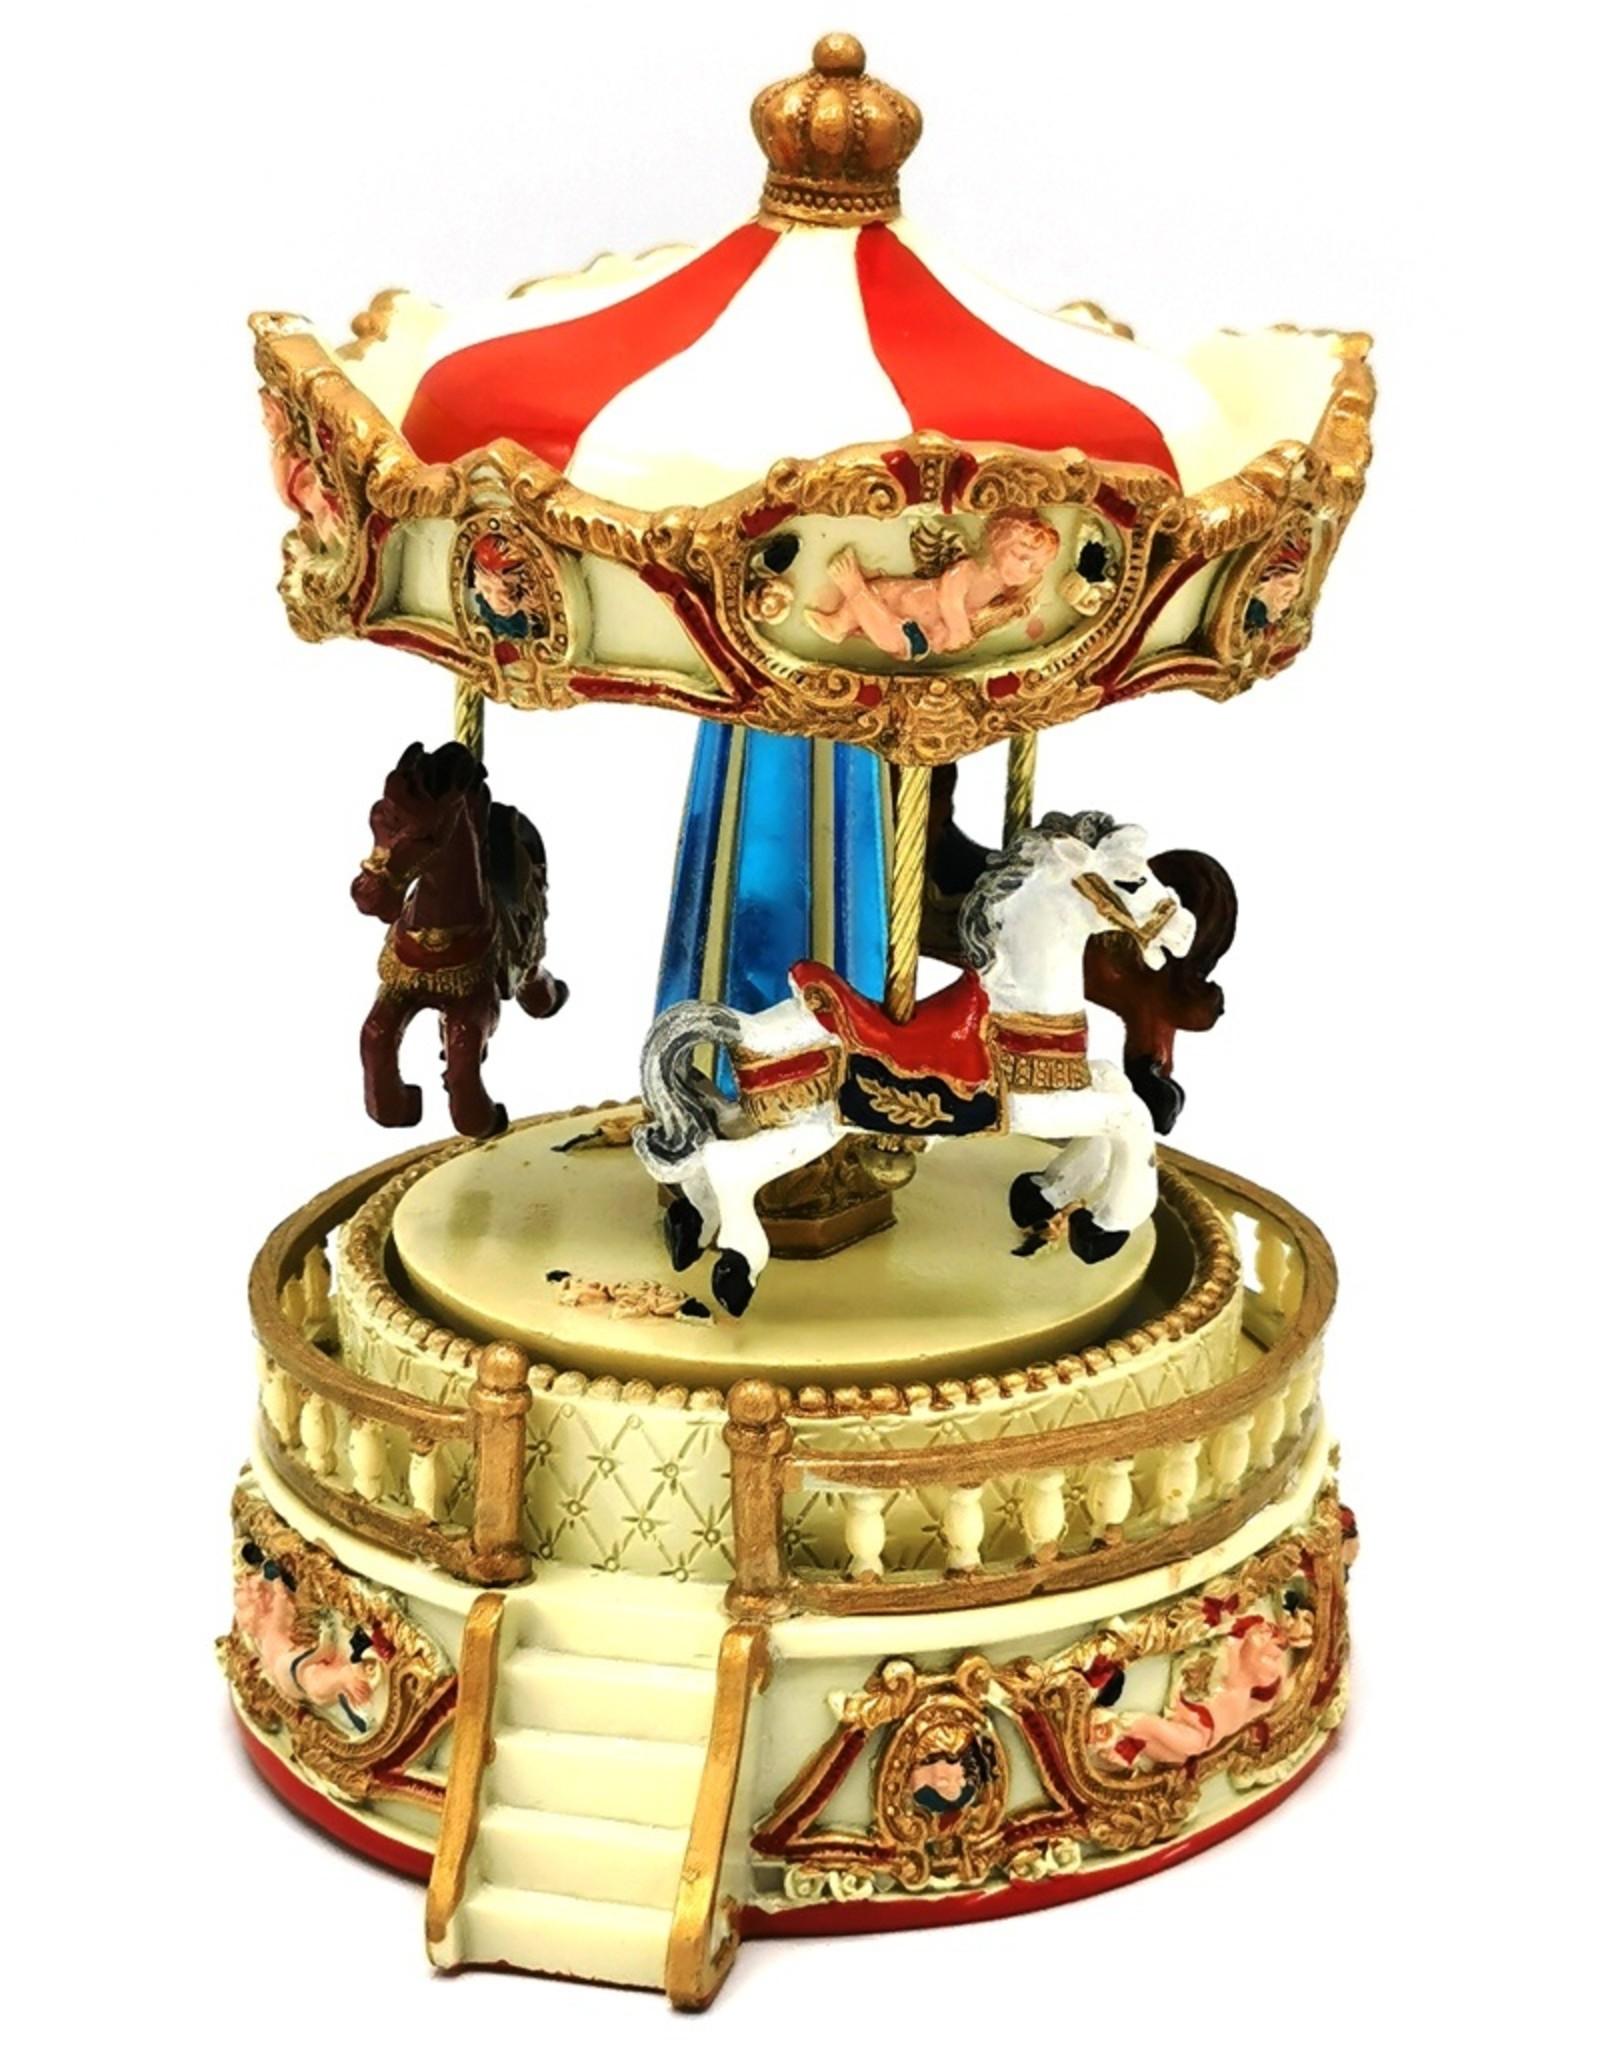 Vintage muziekdoos carrousel Miscellaneous - Muziekdoos Carrousel klein